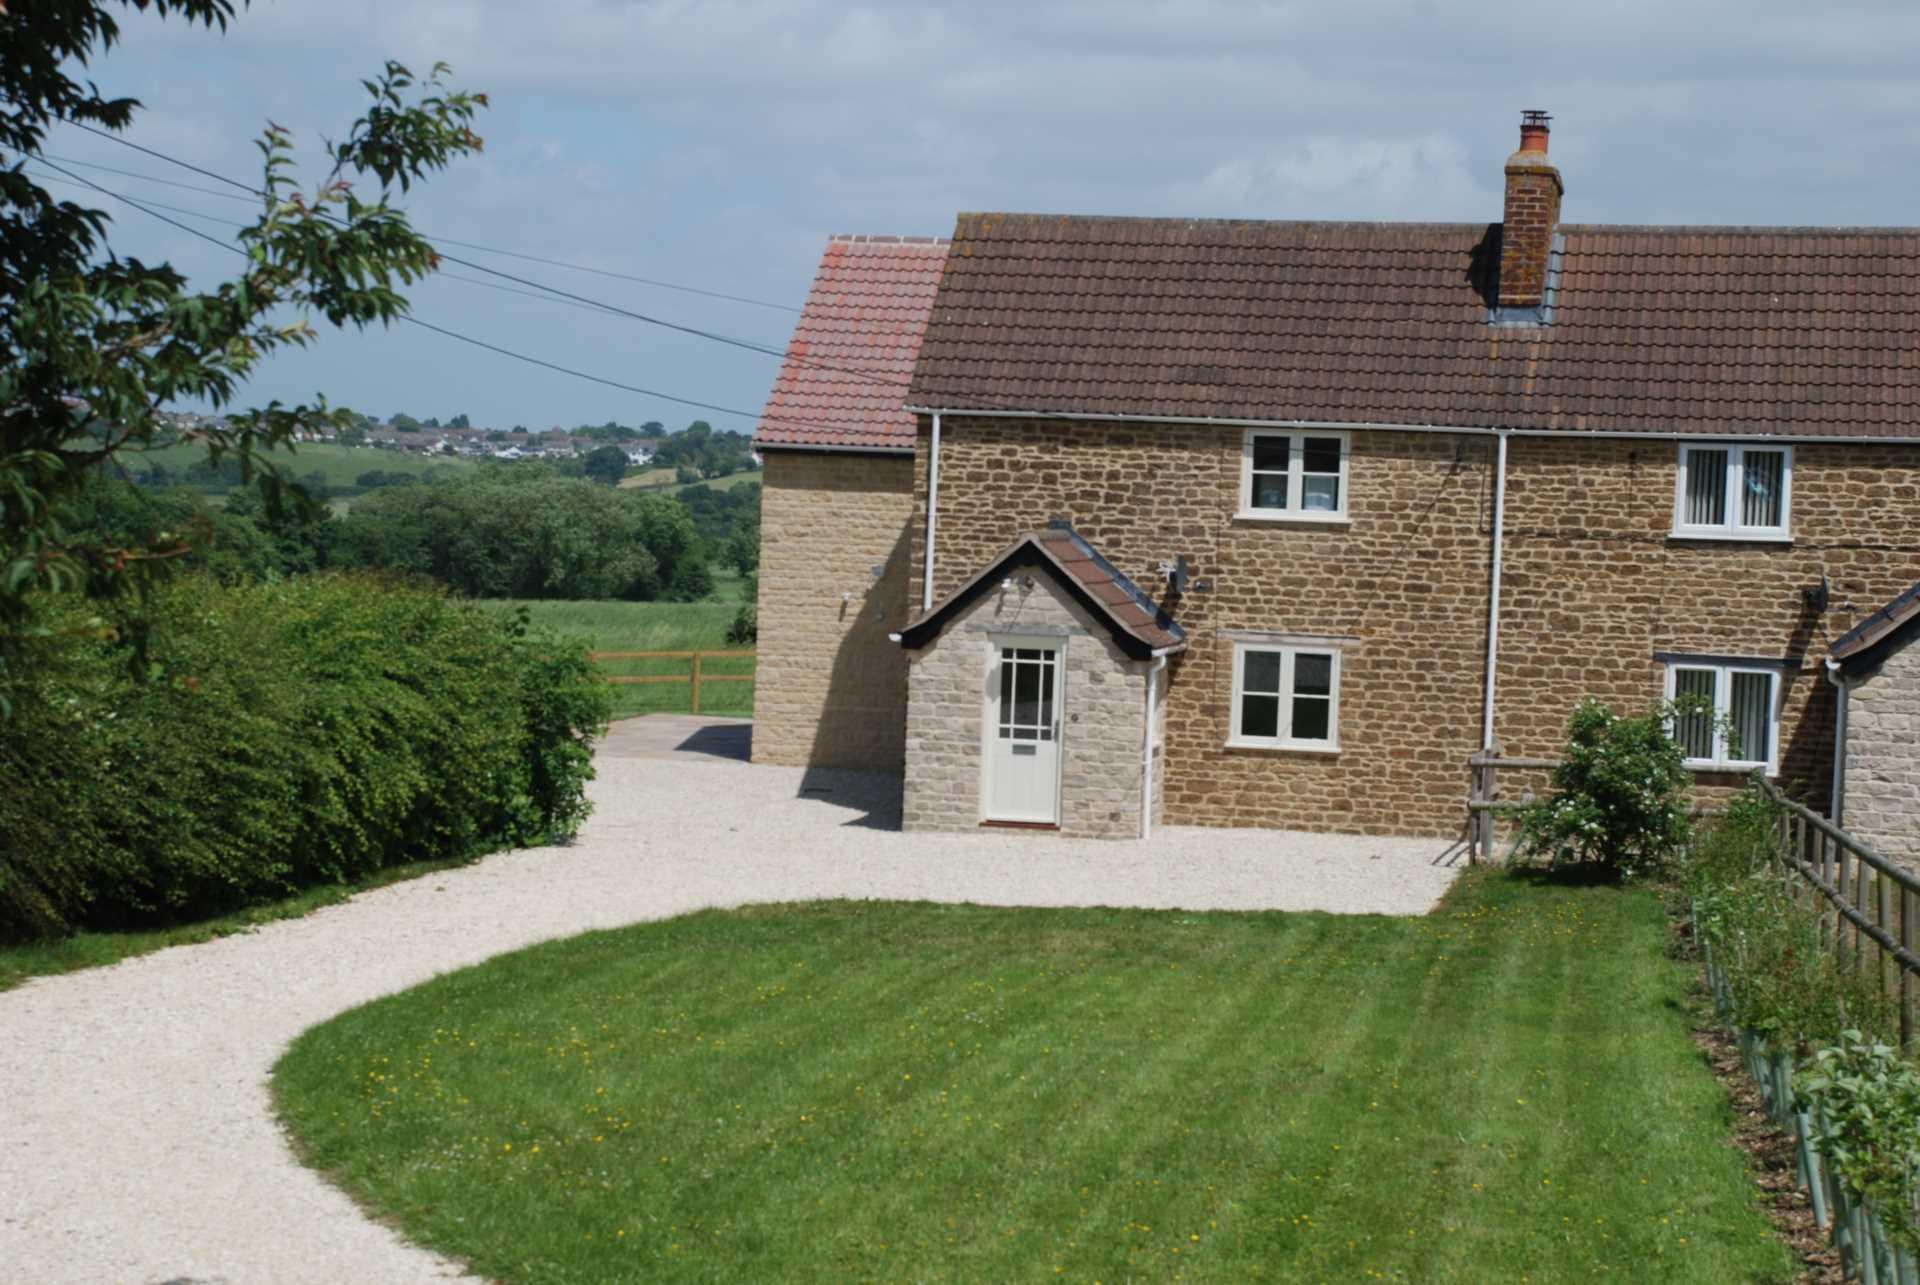 Swallows Property Letting - 4 Bedroom Semi-Detached, Marston Bigot